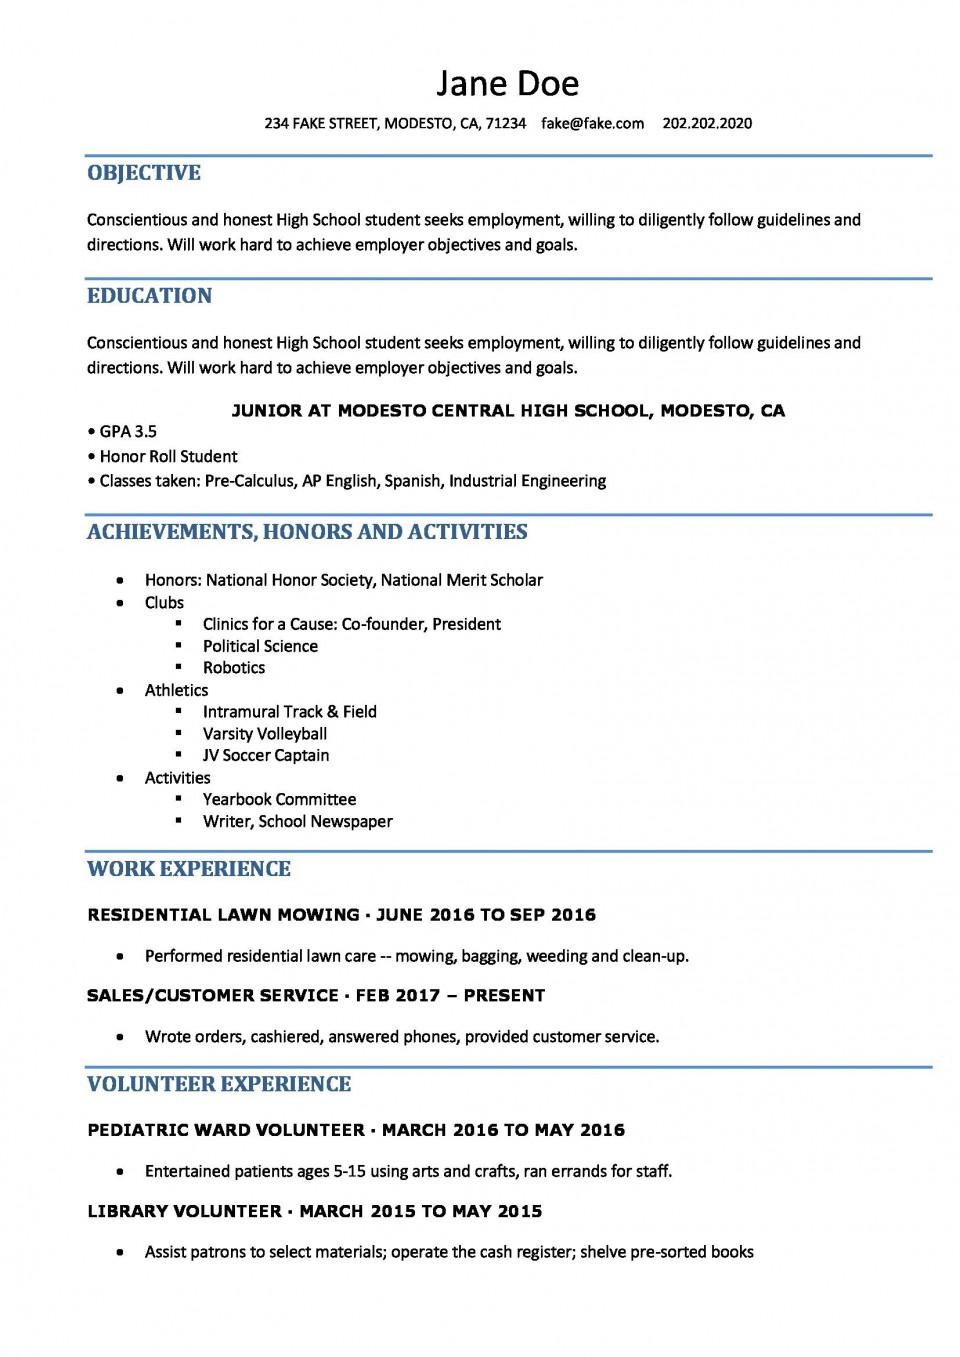 006 Singular Resume Template High School Student Idea  Sample First Job960